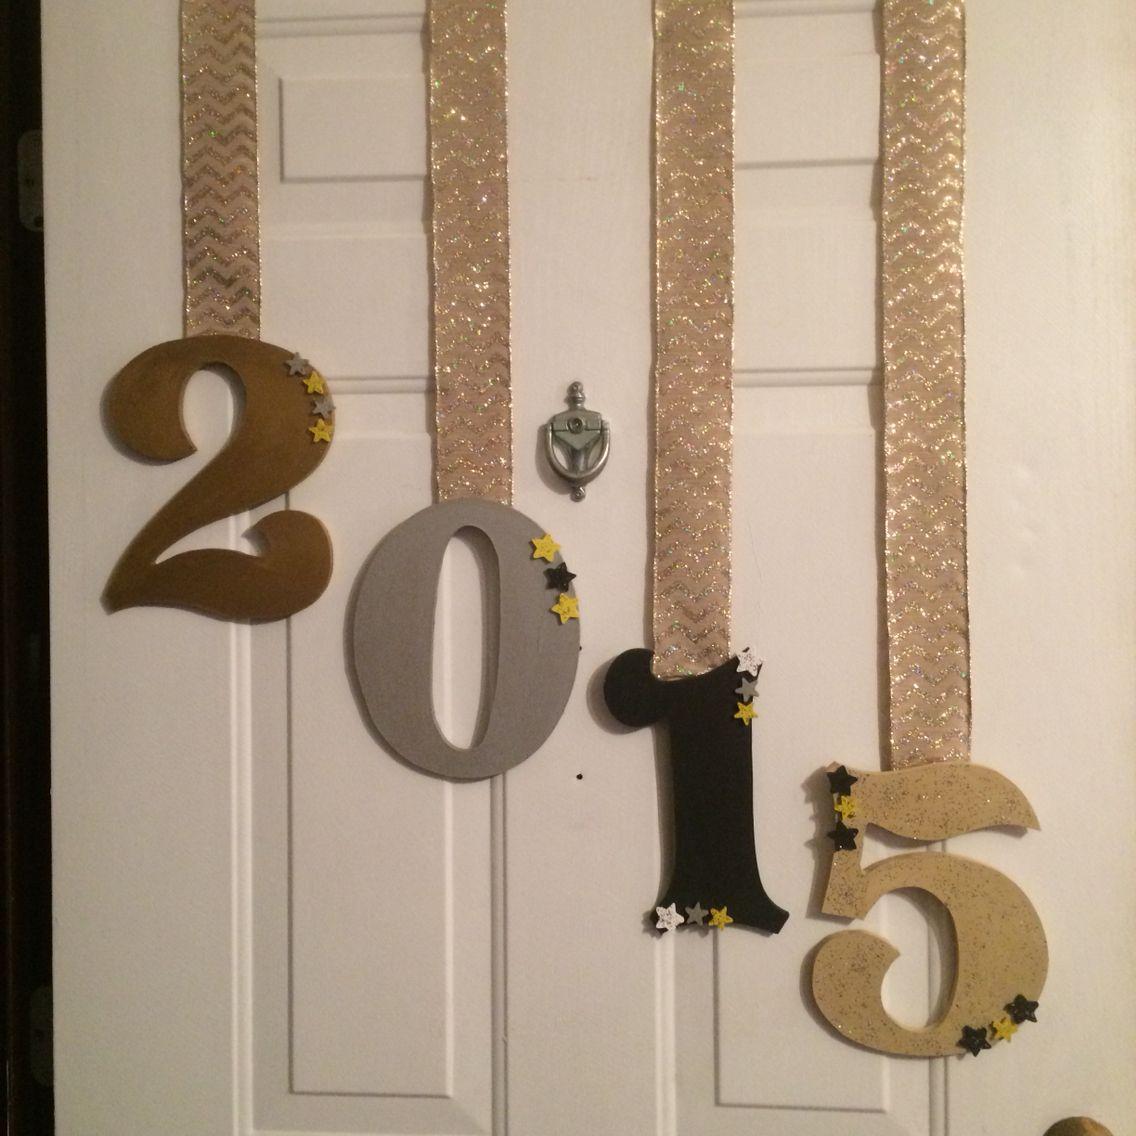 Happy new year door decor   New years eve decorations, Diy ...